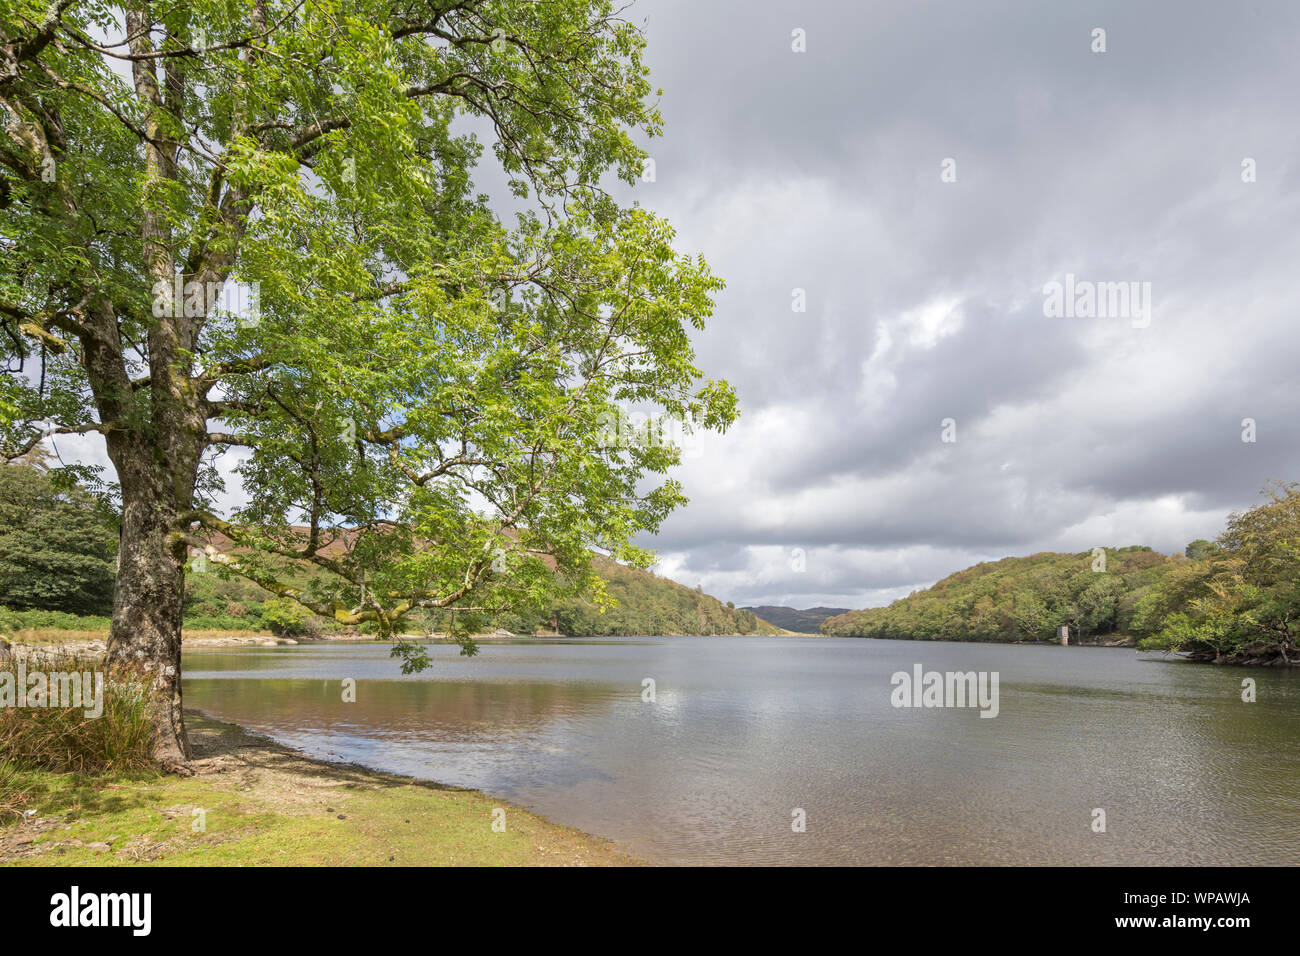 Llyn Cynwch lake on the popular Precipice Walk, Snowdonia National Park, North Wales, UK Stock Photo